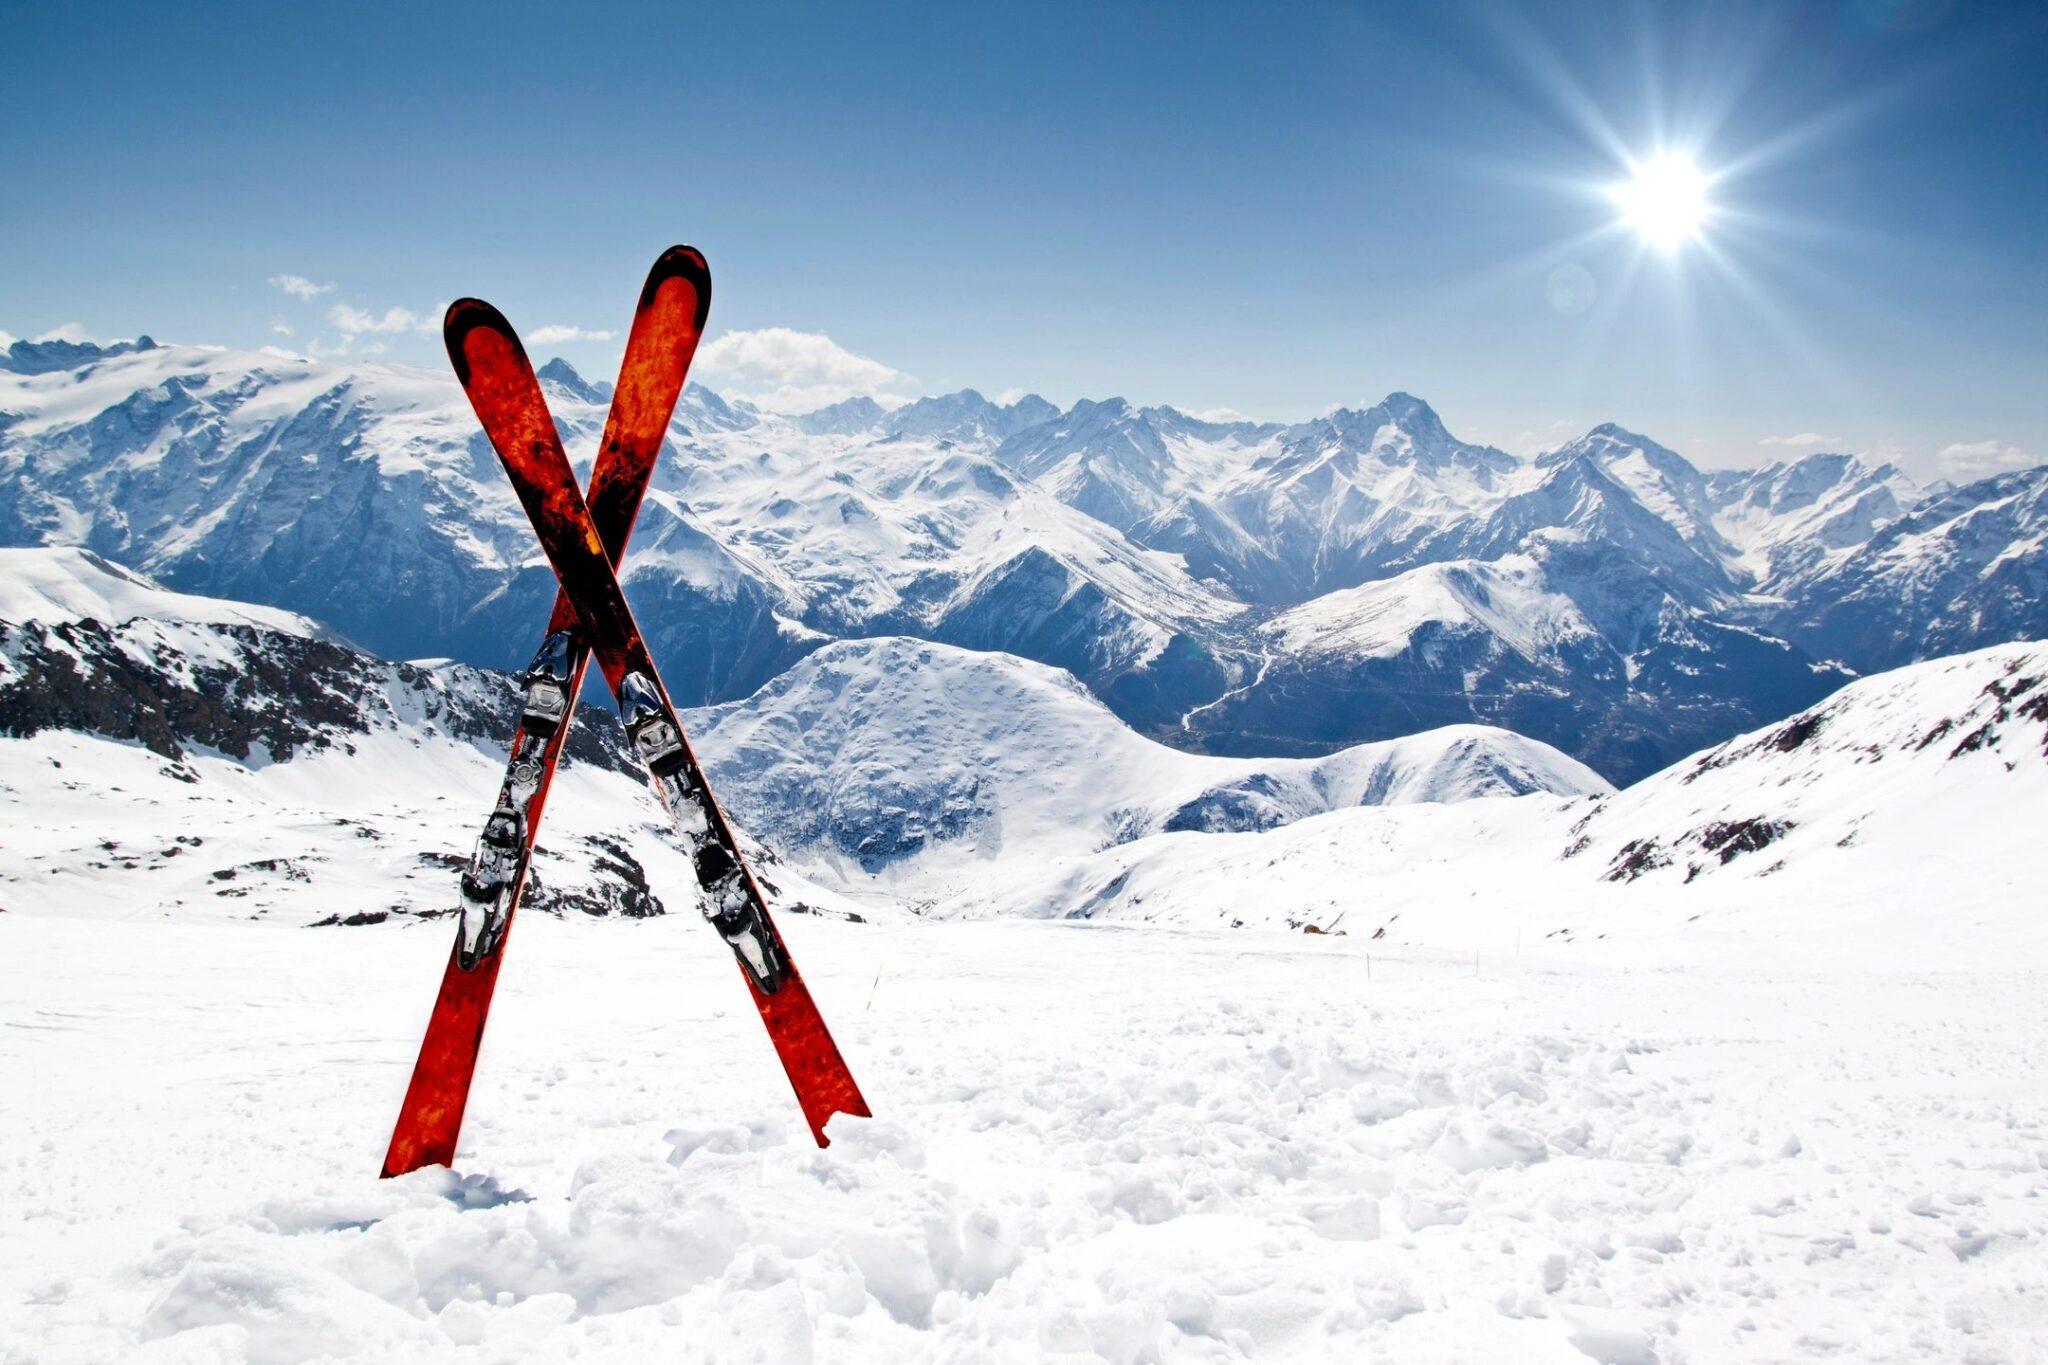 Switzerland ski holiday packages